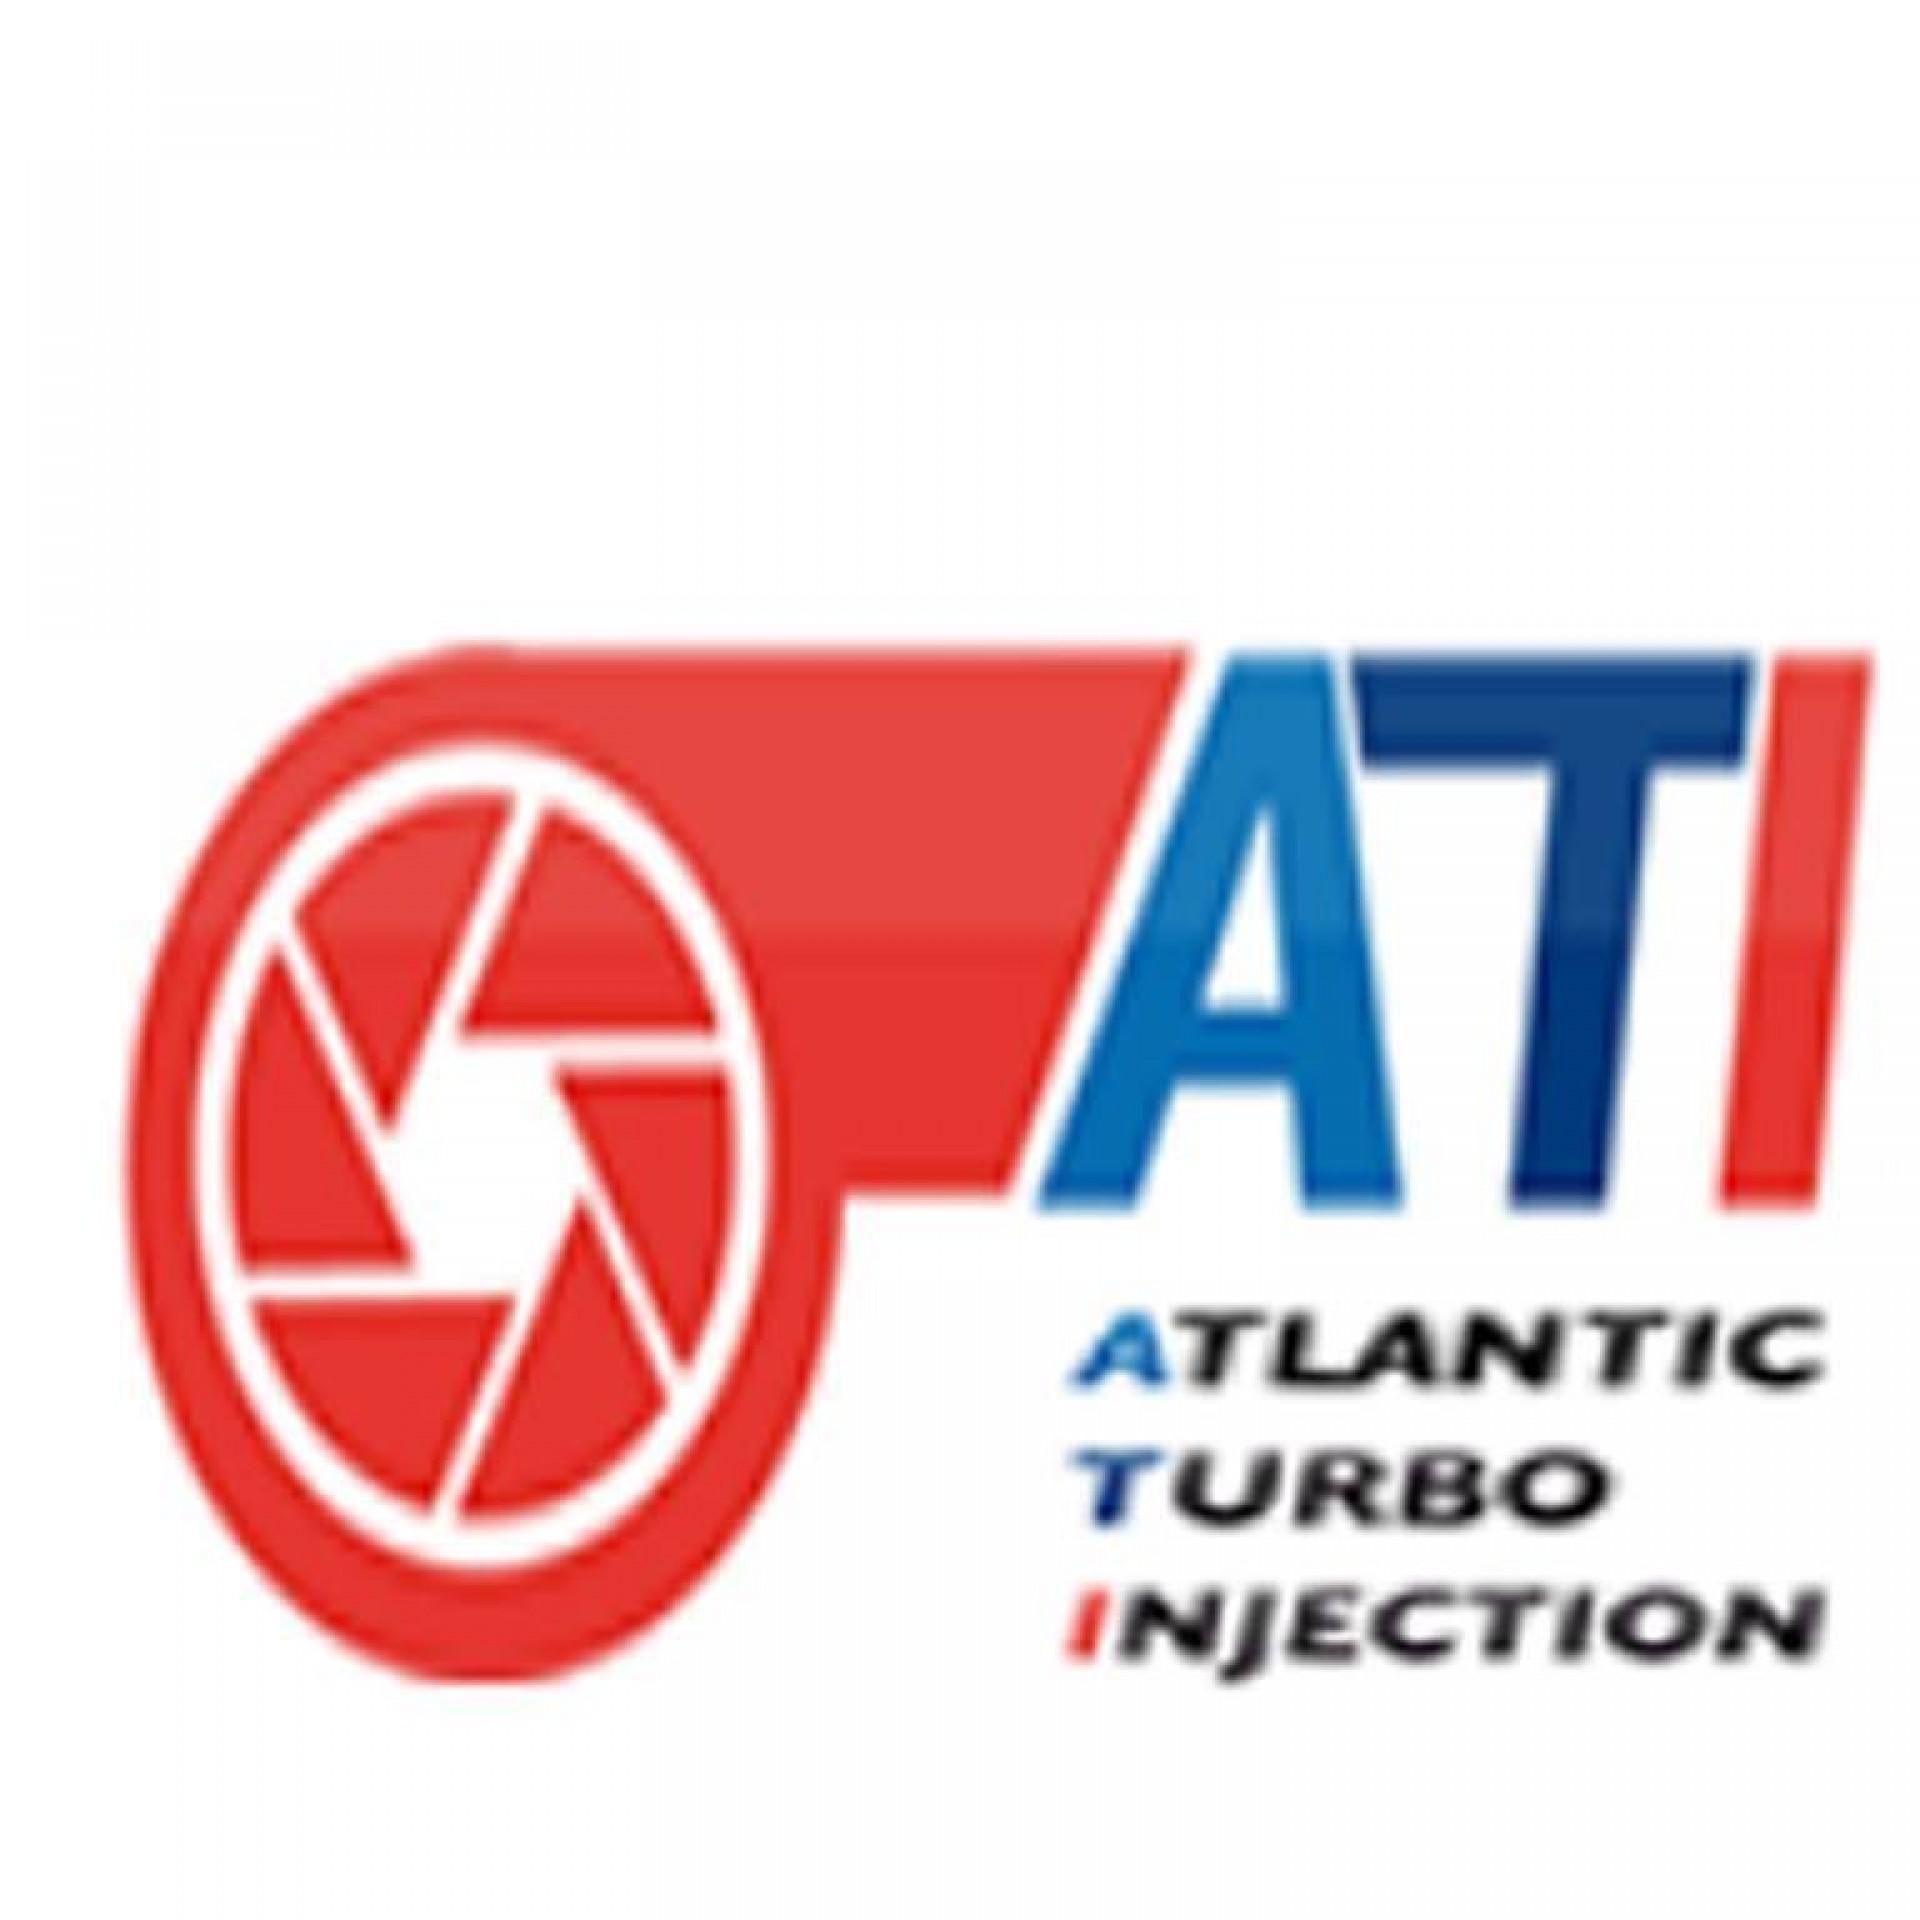 ATI-ENGINEERING (Atlantic Turbo Injection) logo